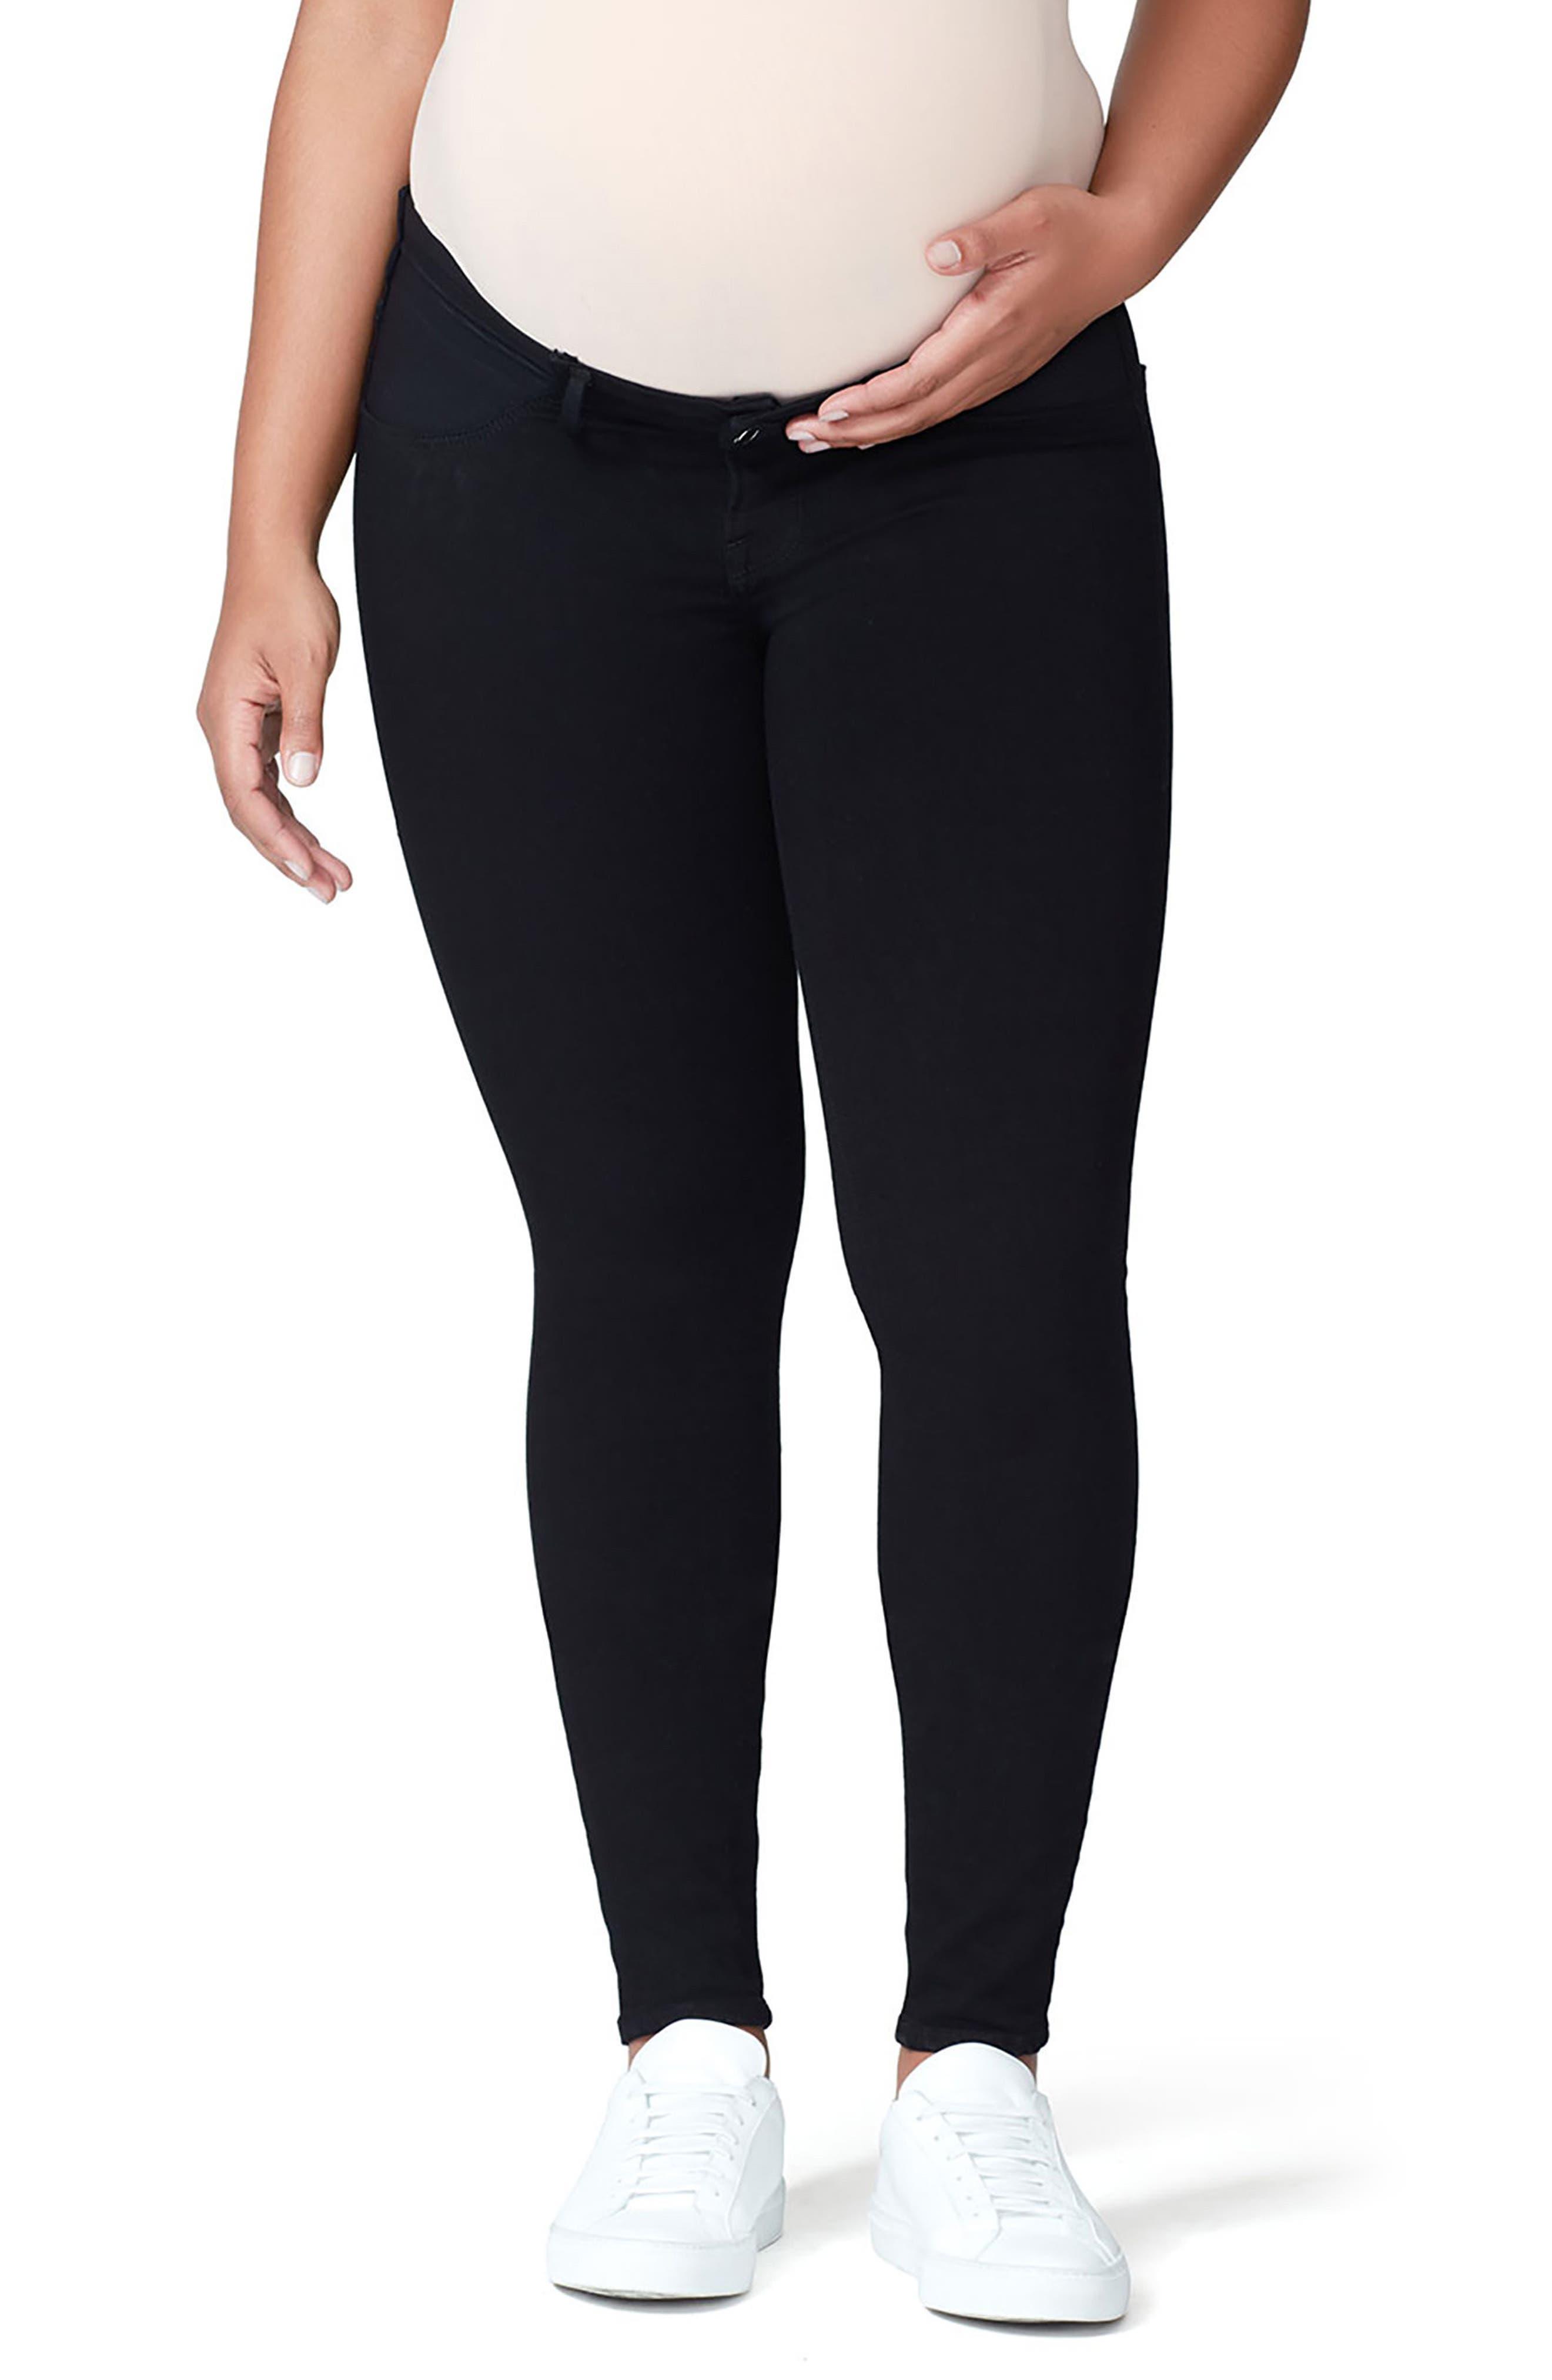 Good Mama The Honeymoon Low Rise Maternity Skinny Jeans,                         Main,                         color, Black